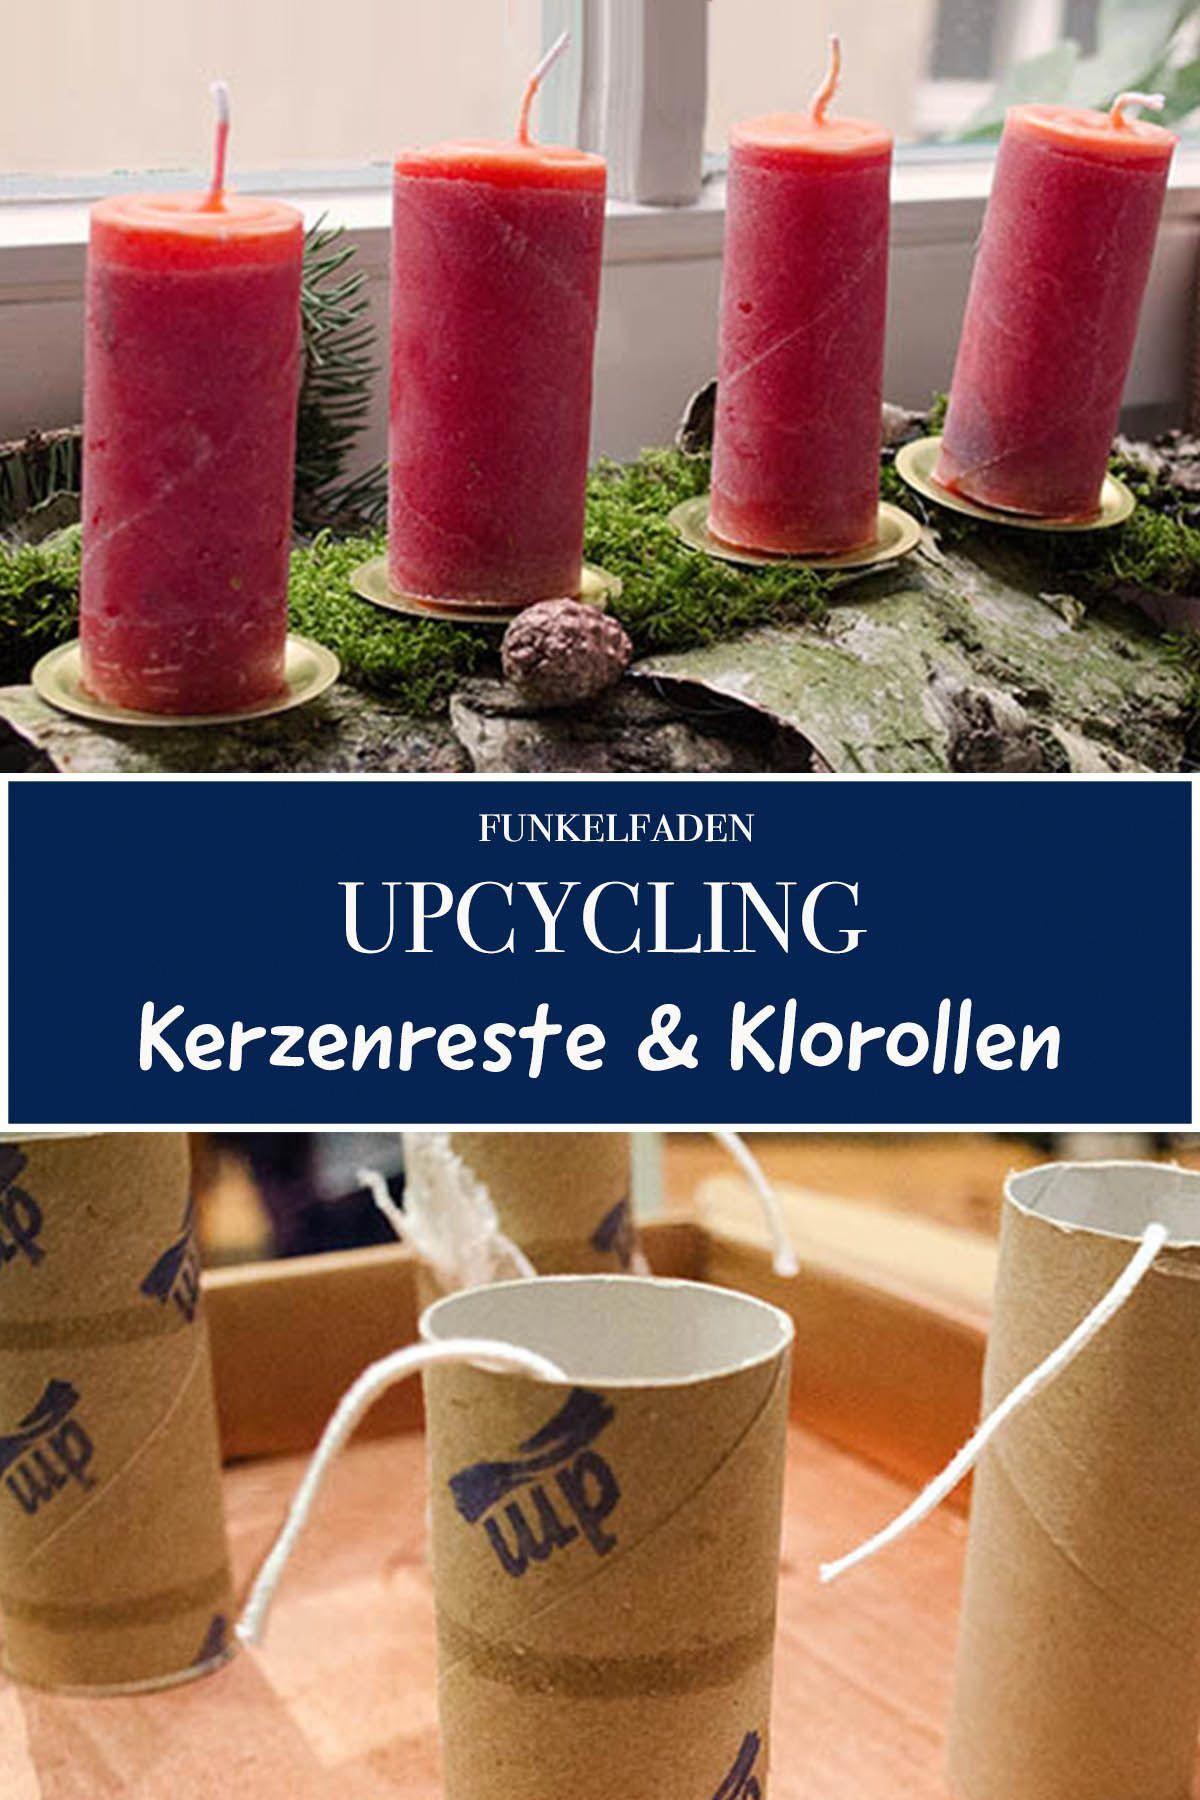 Anleitung Upcycling Kerzen Aus Kerzenresten Und Klorollen Giessen